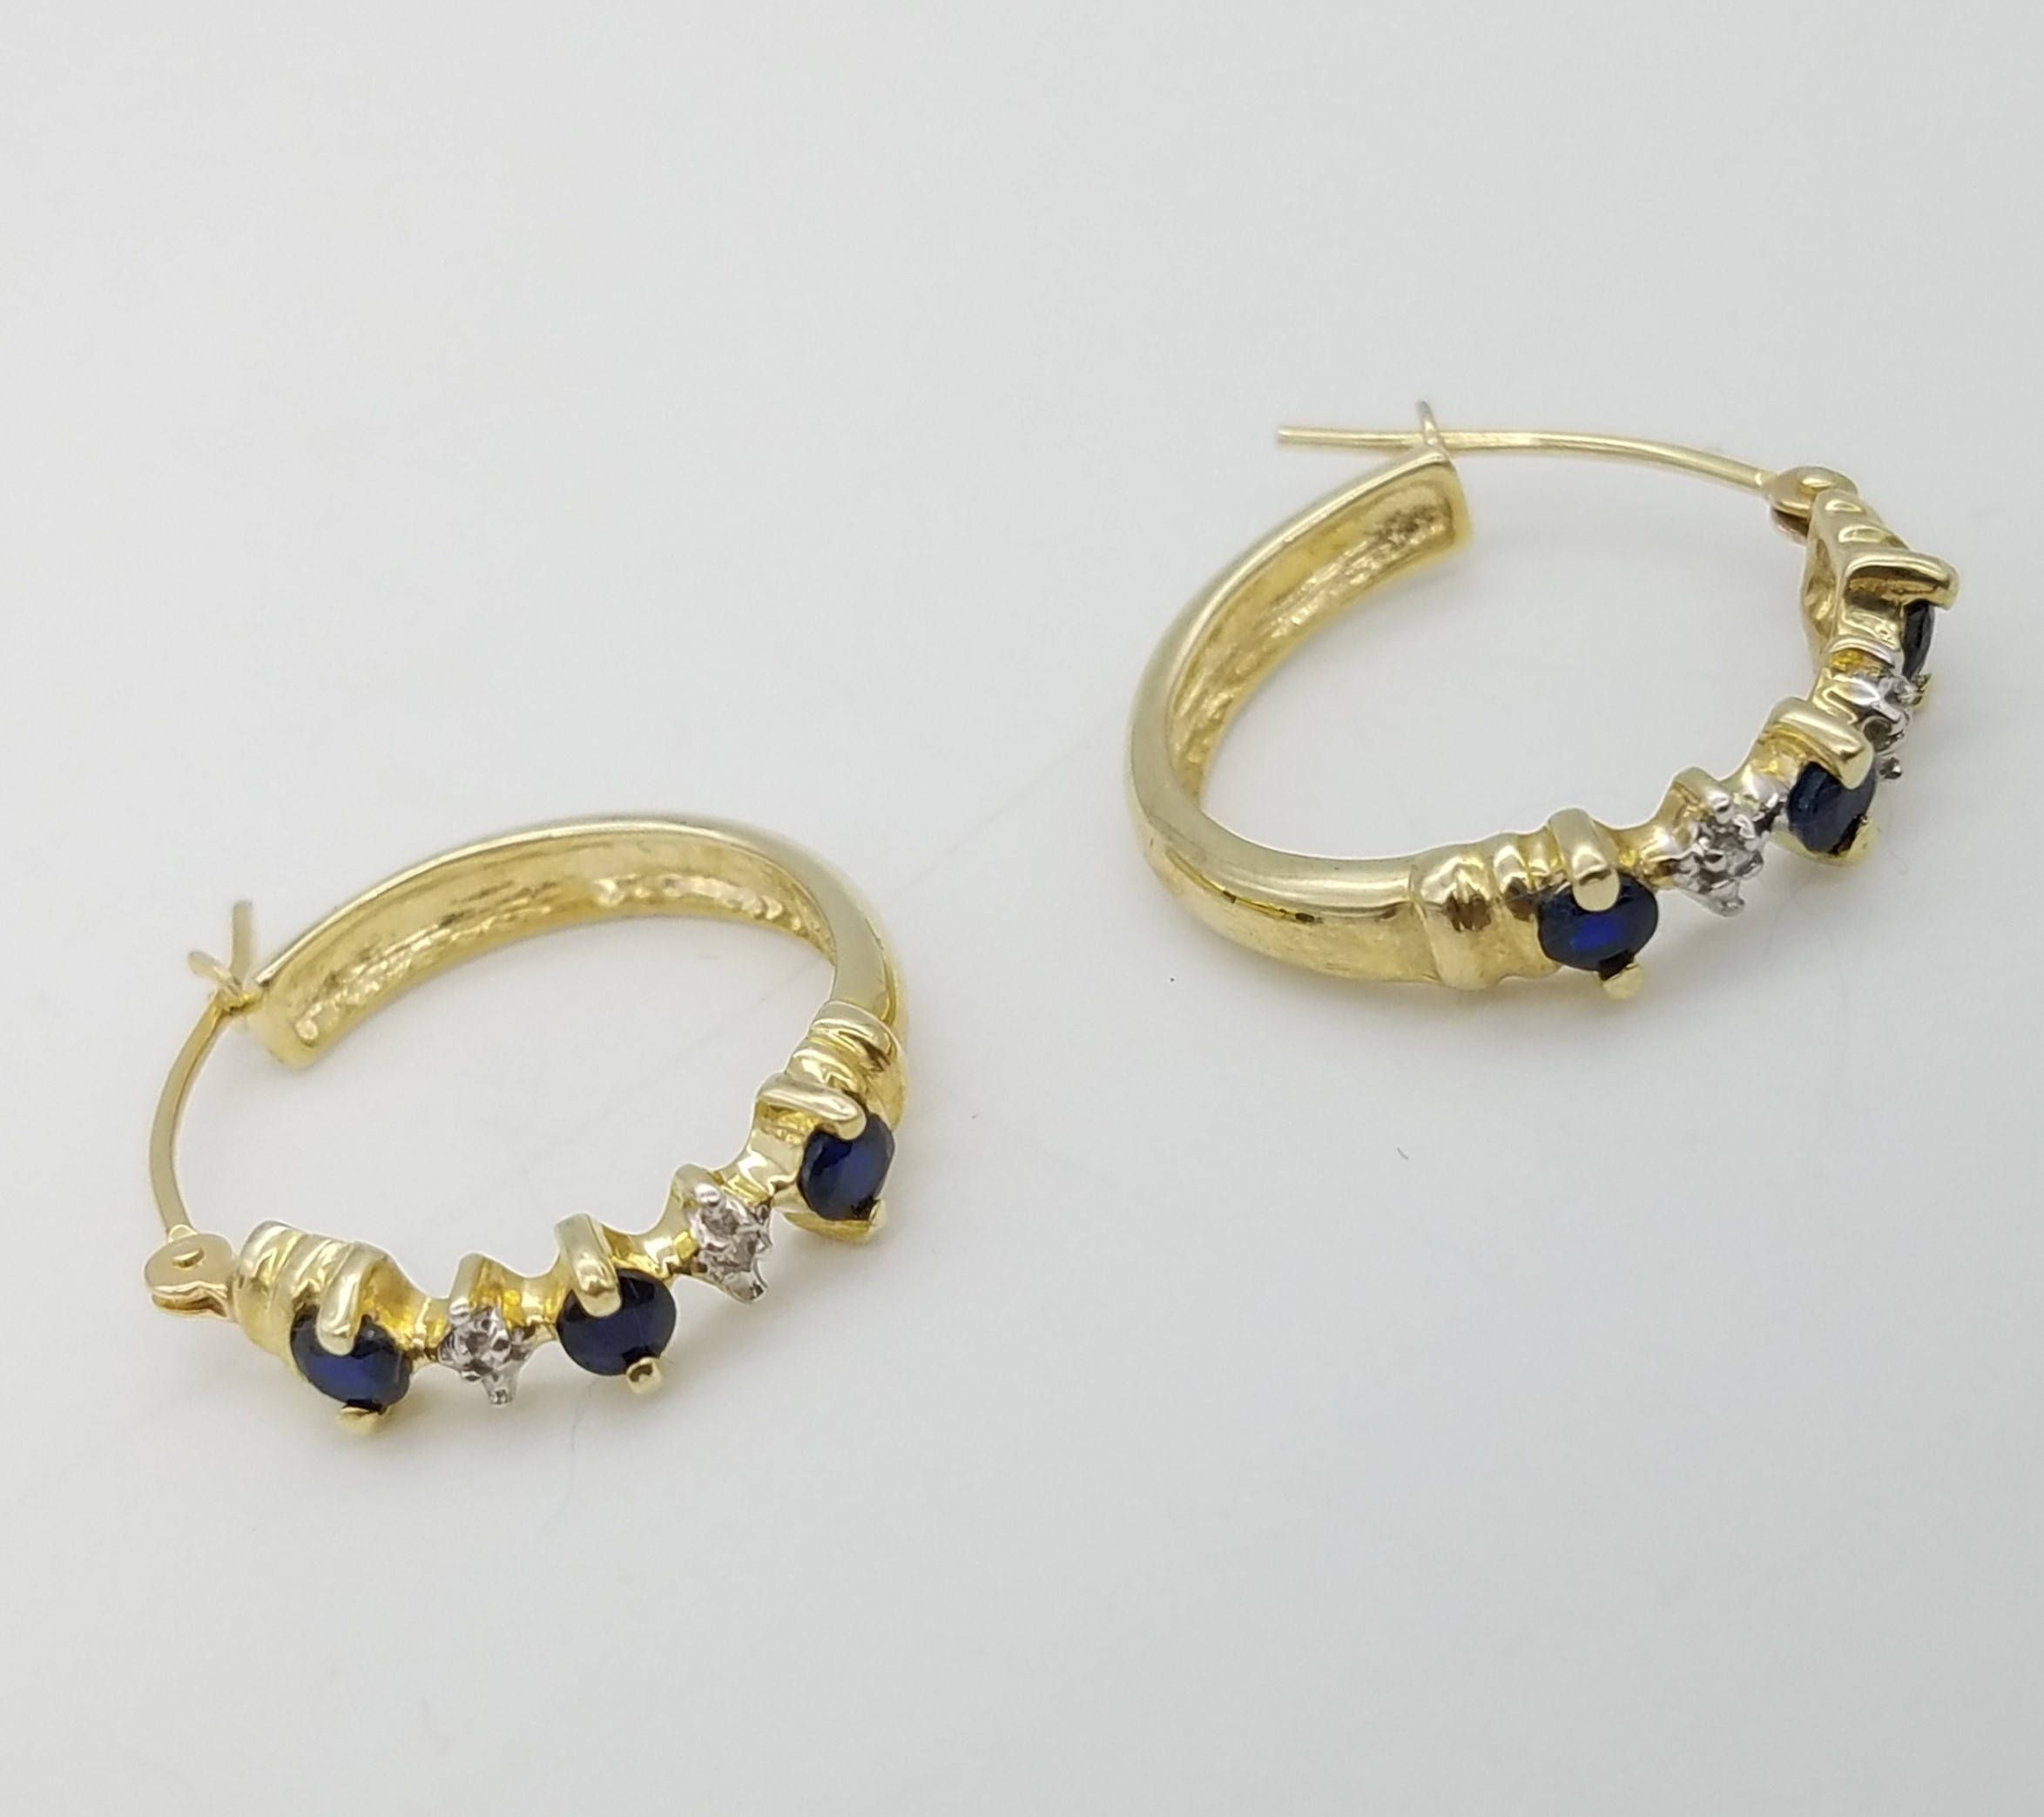 Vintage Shire Diamond Solid 14k Gold Hinged Hoop Estate Earrings By Thingsgrandmakept1 On Etsy